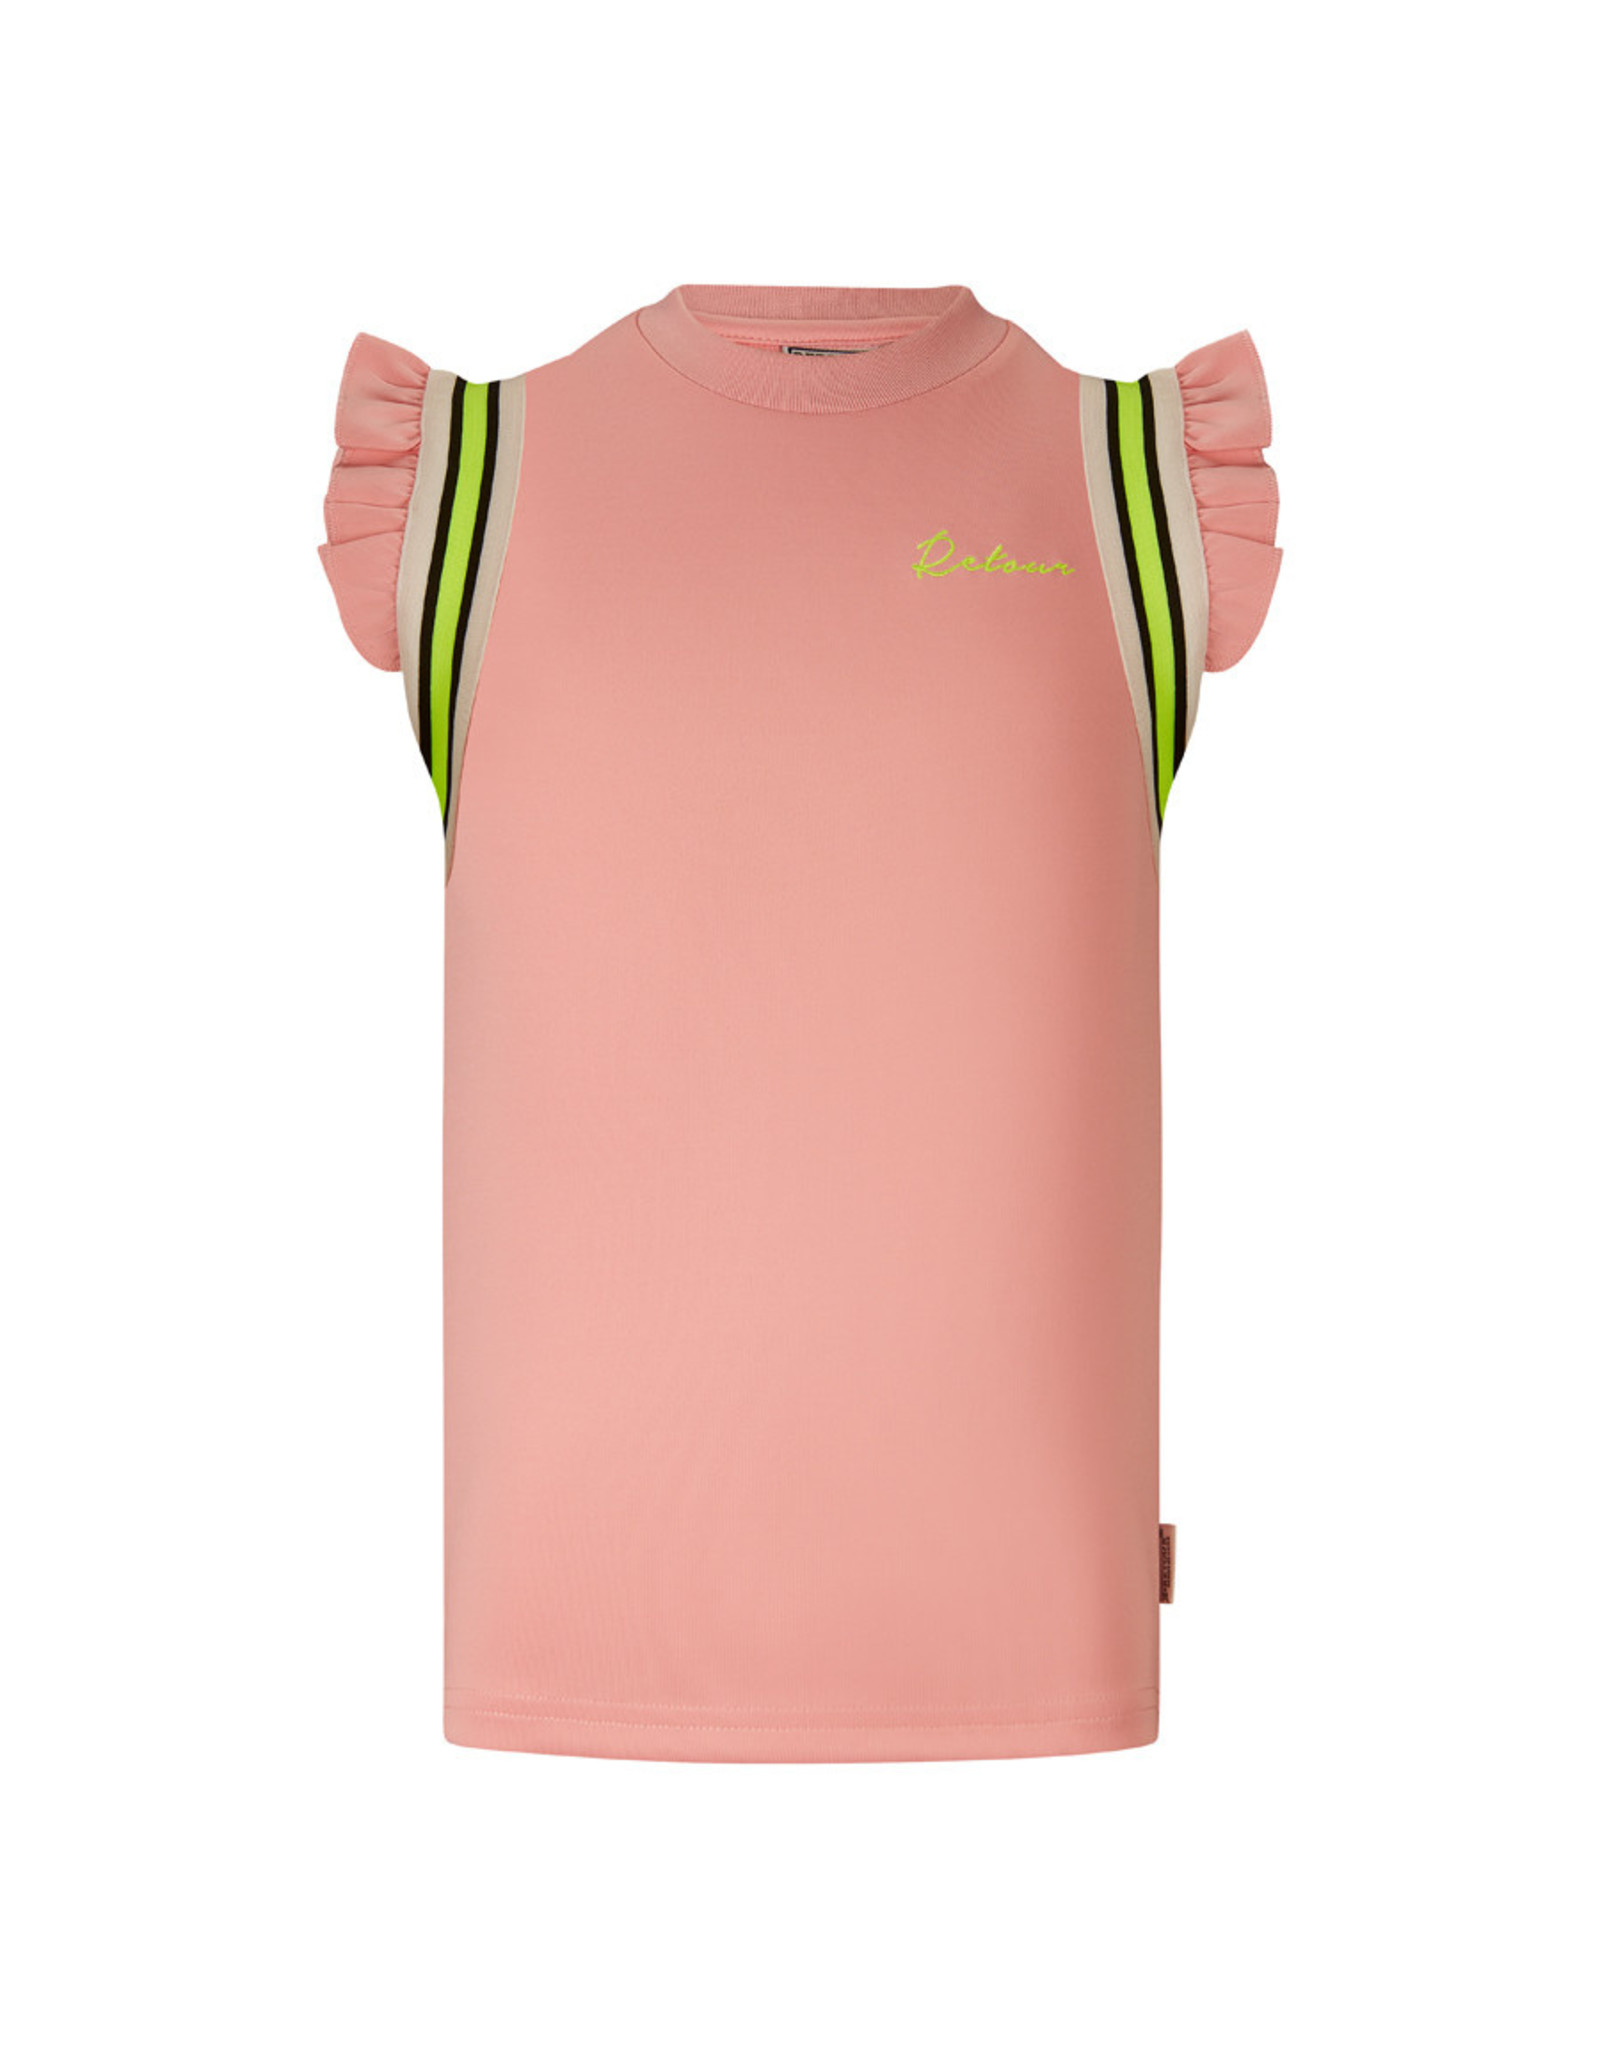 RETOUR Retour meiden t-shirt Lorena Old Pink